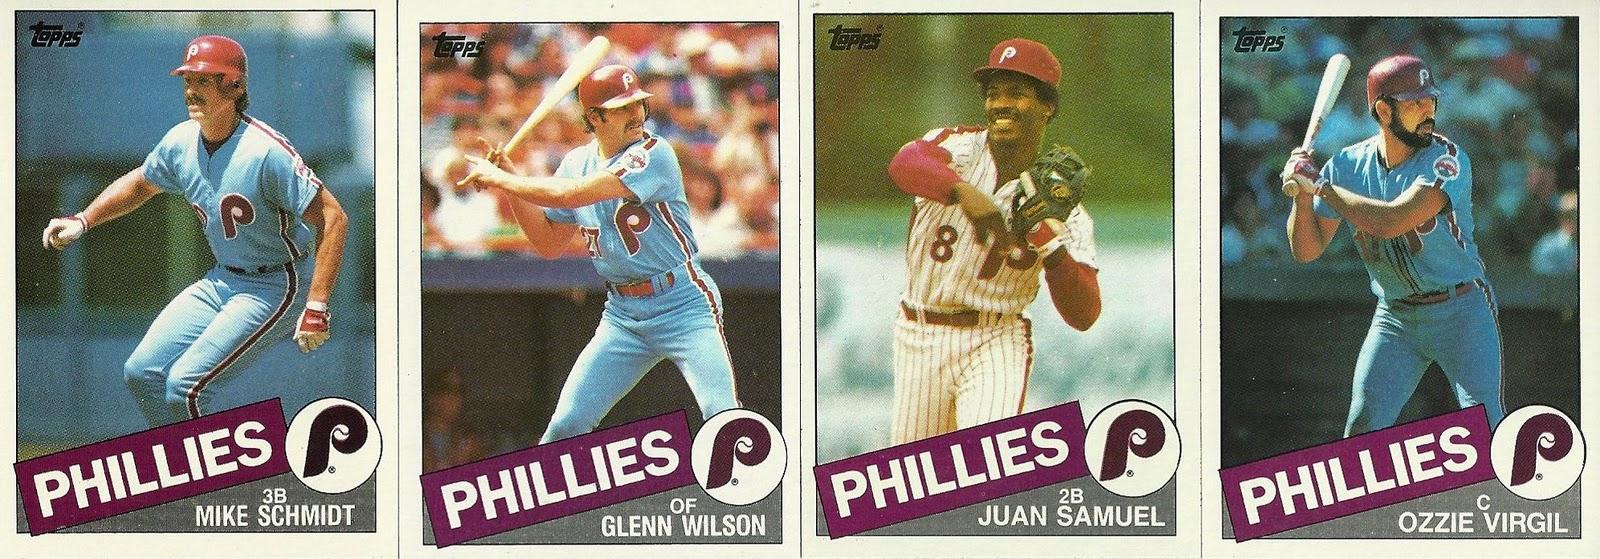 1985+Topps+Phillies+1.jpg